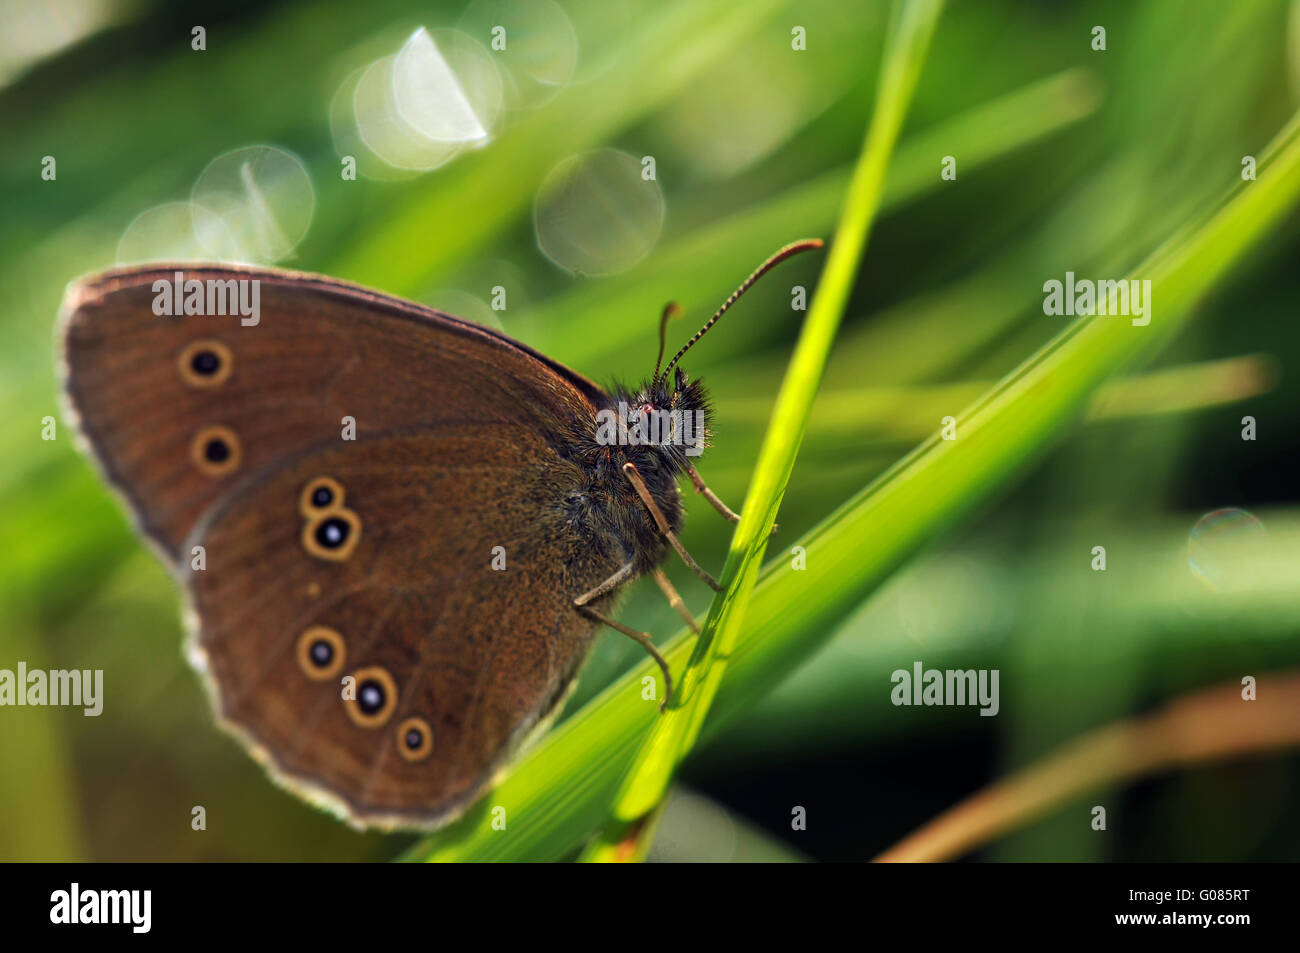 ringlet (butterfly) - Stock Image